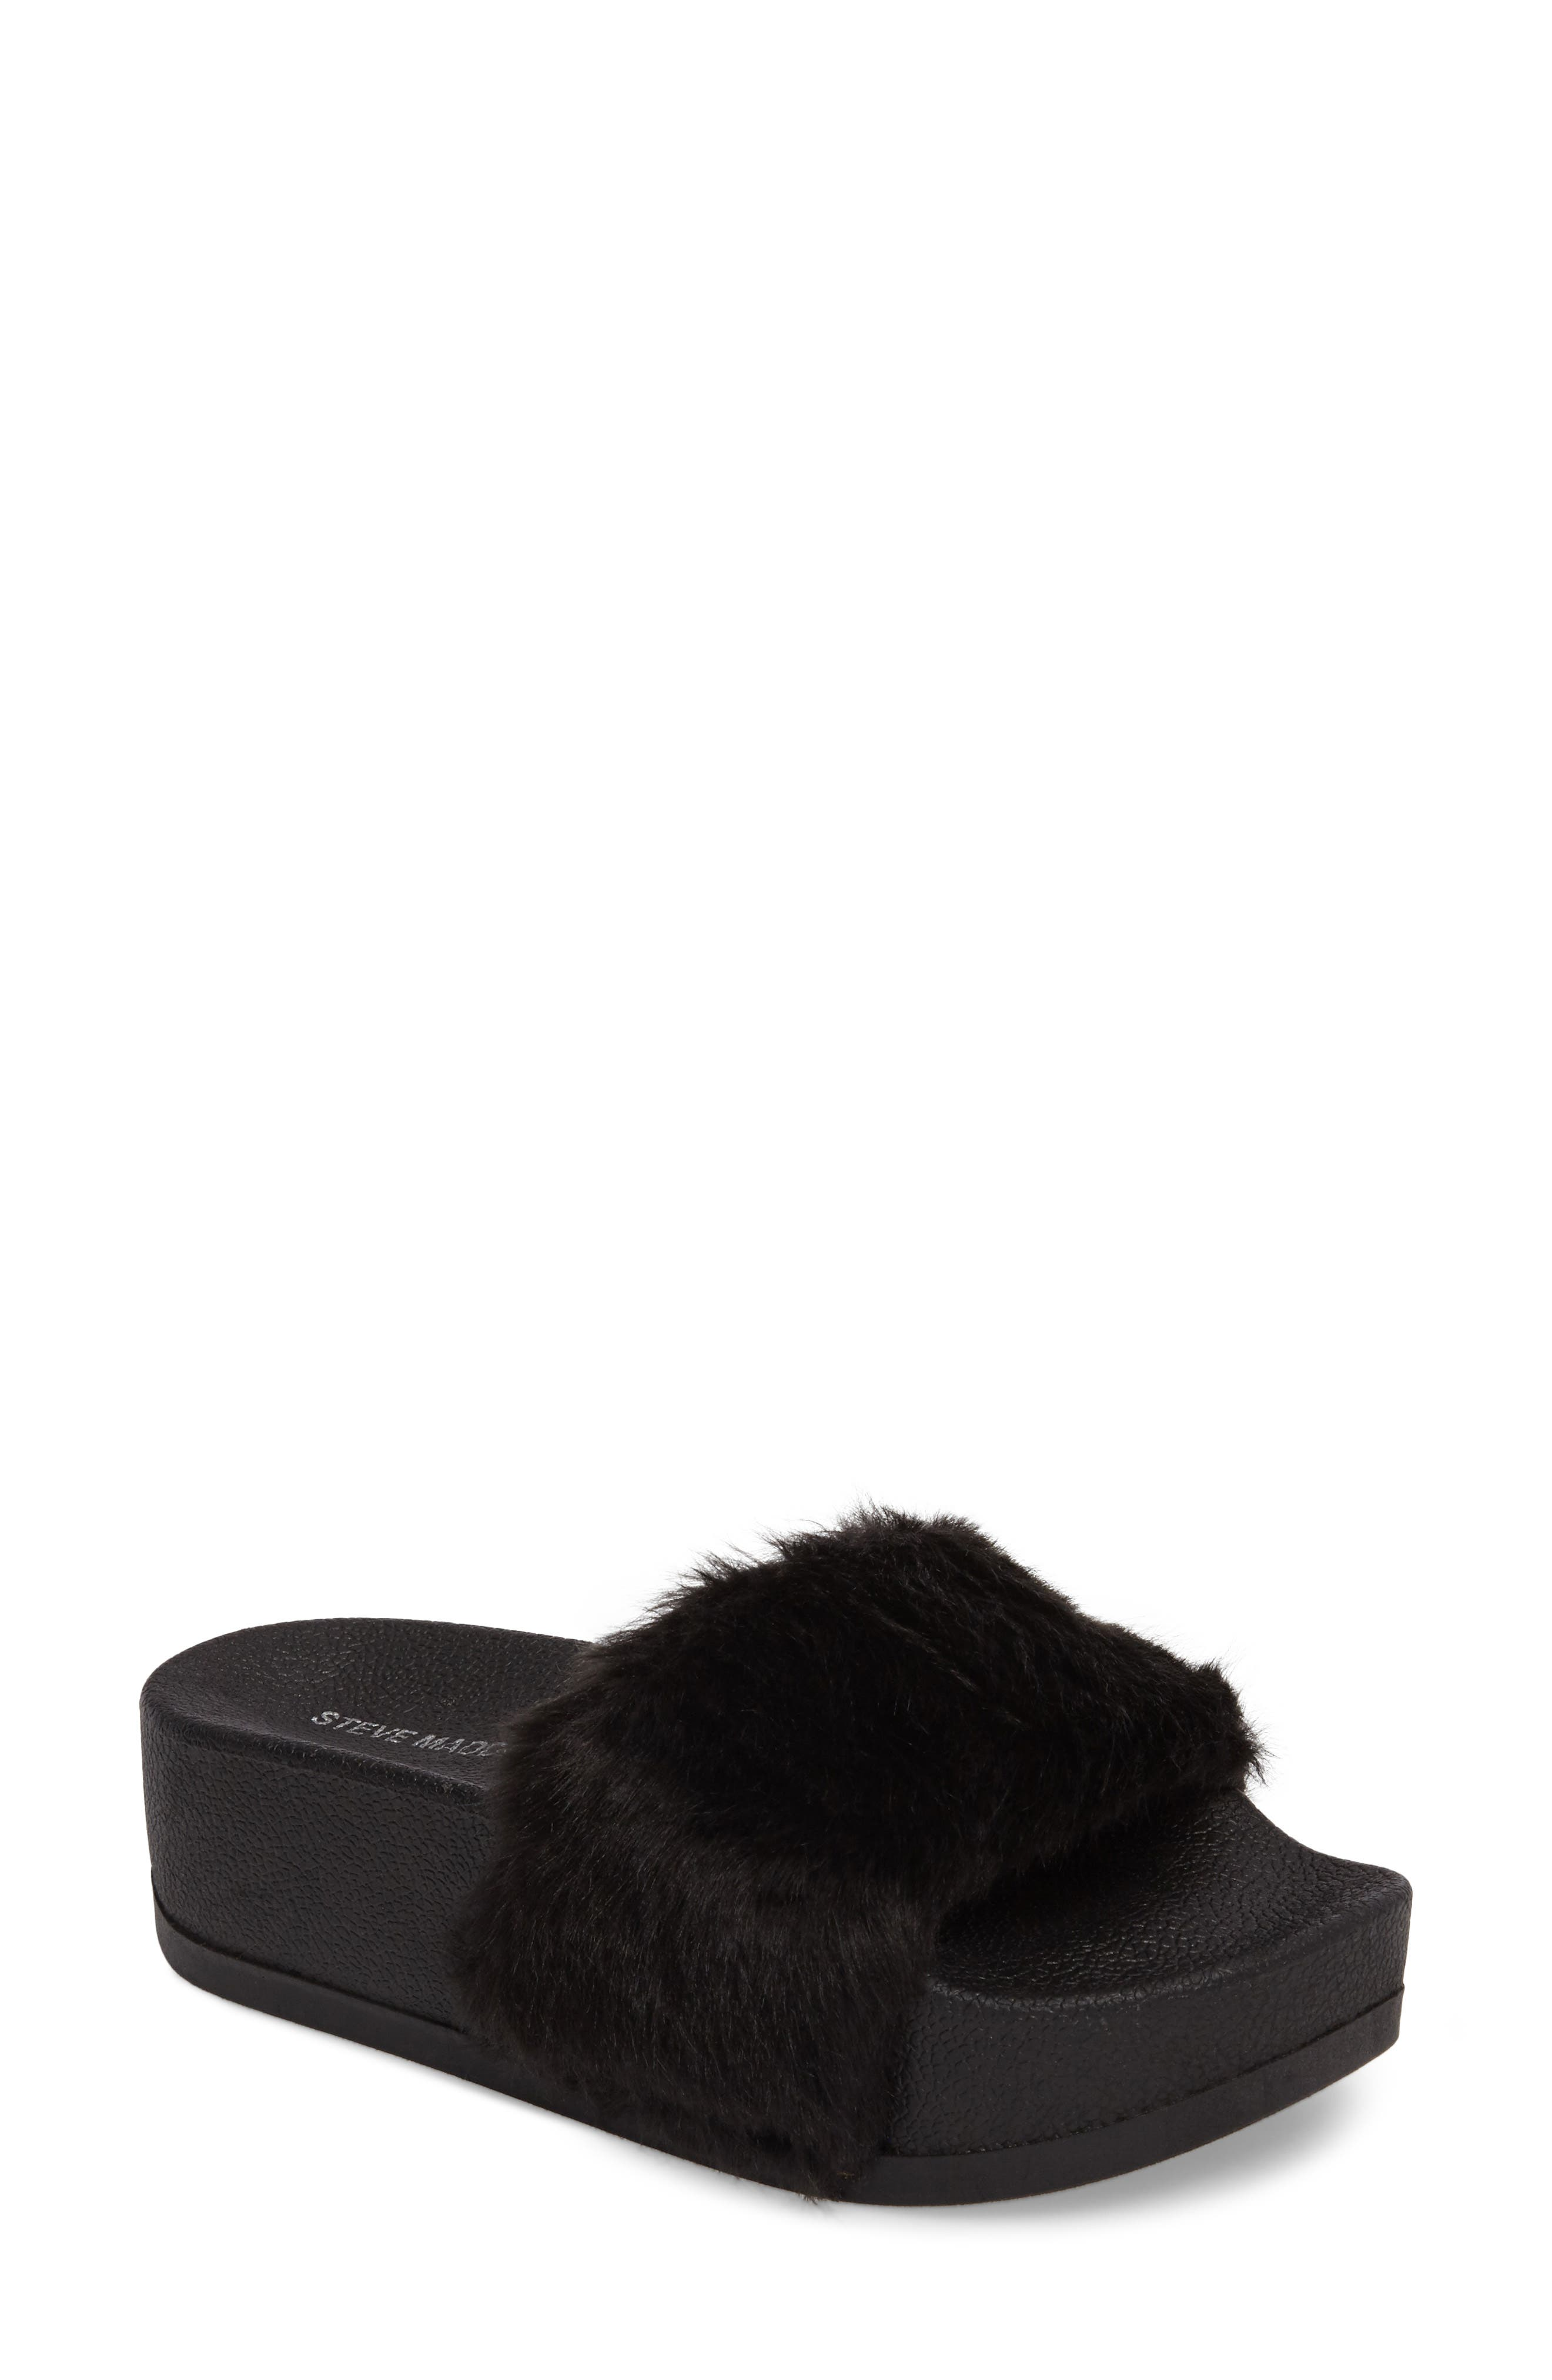 STEVE MADDEN,                             Softey Faux Fur Platform Slide,                             Main thumbnail 1, color,                             001